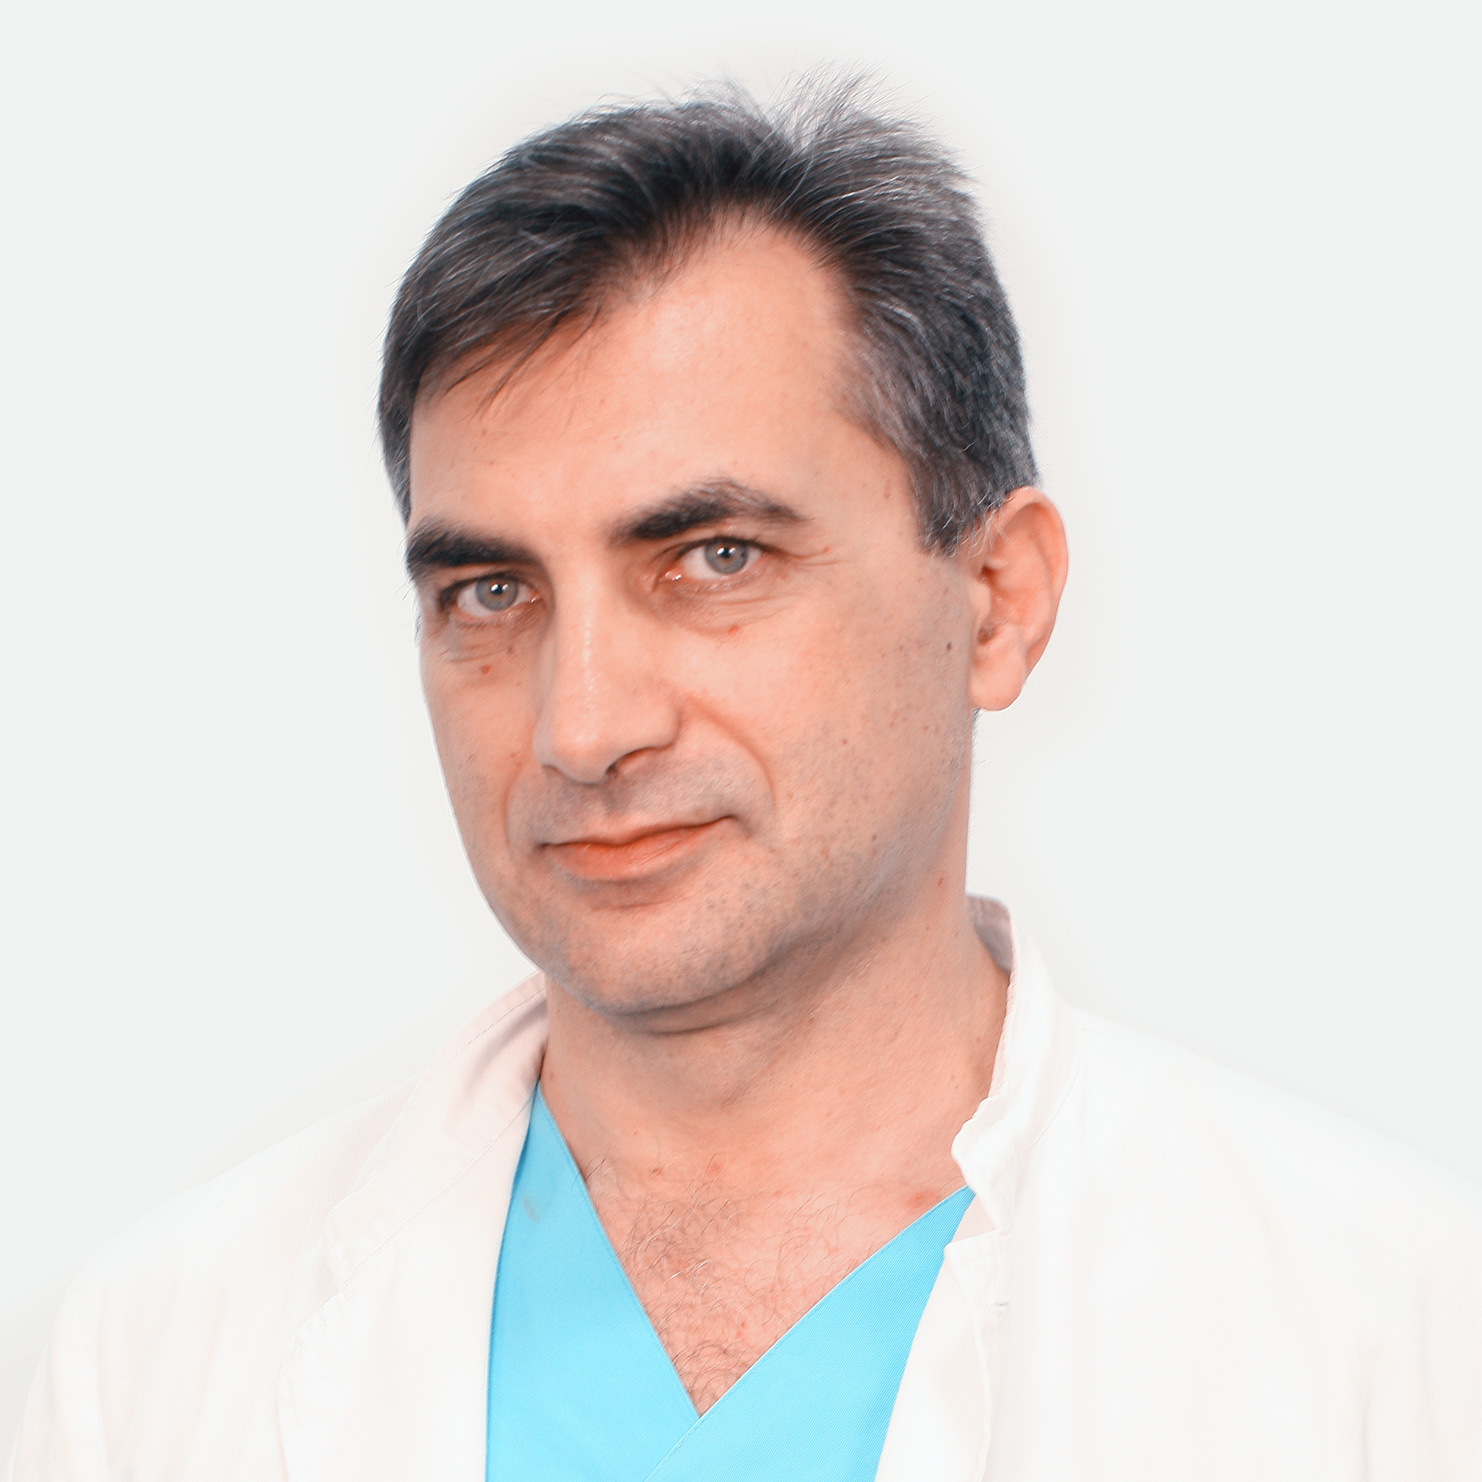 Dr. Damir Žalac